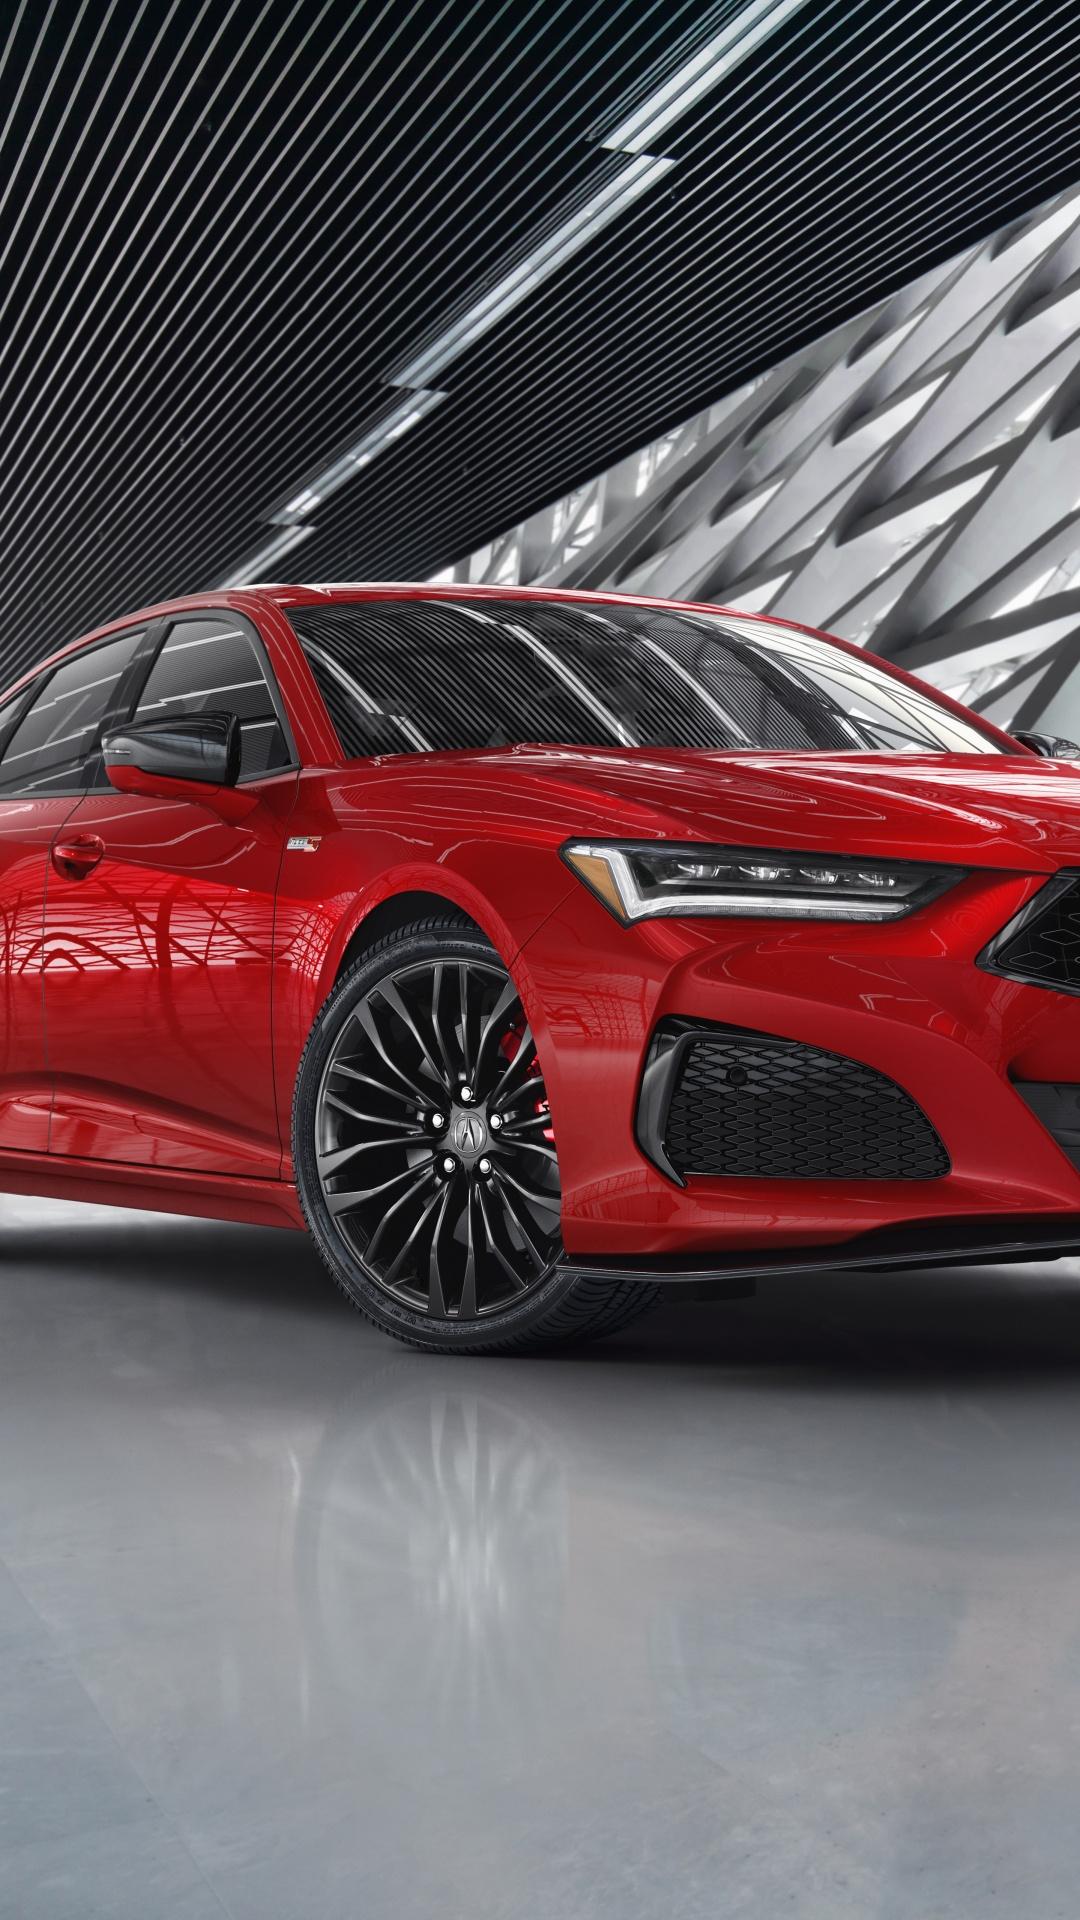 Acura TLX Type S 4K Wallpaper, 2021, 5K, 8K, Cars, #1187